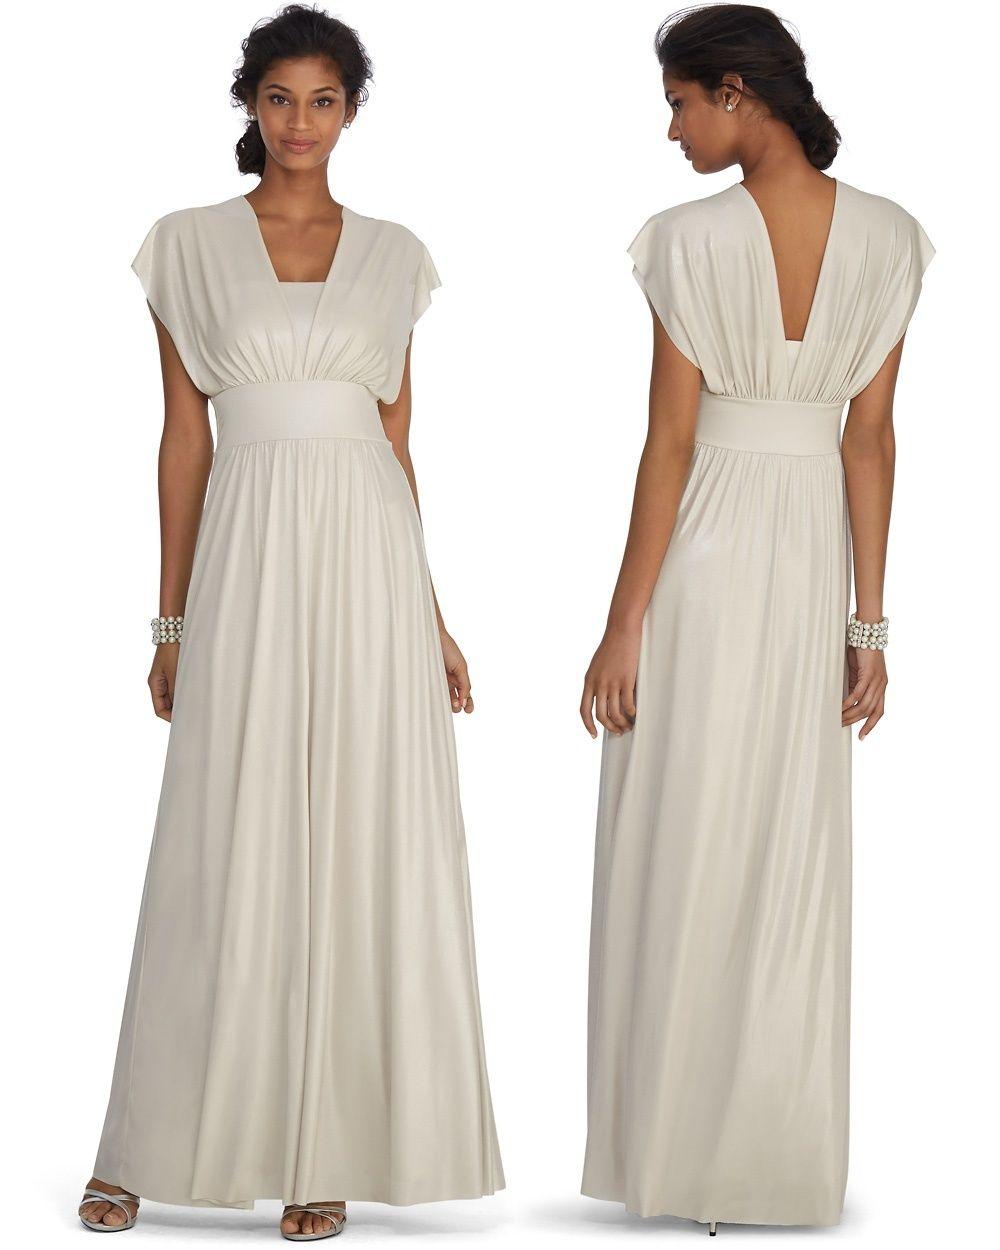 Genius Metallic Convertible Champagne Bridesmaid Gown